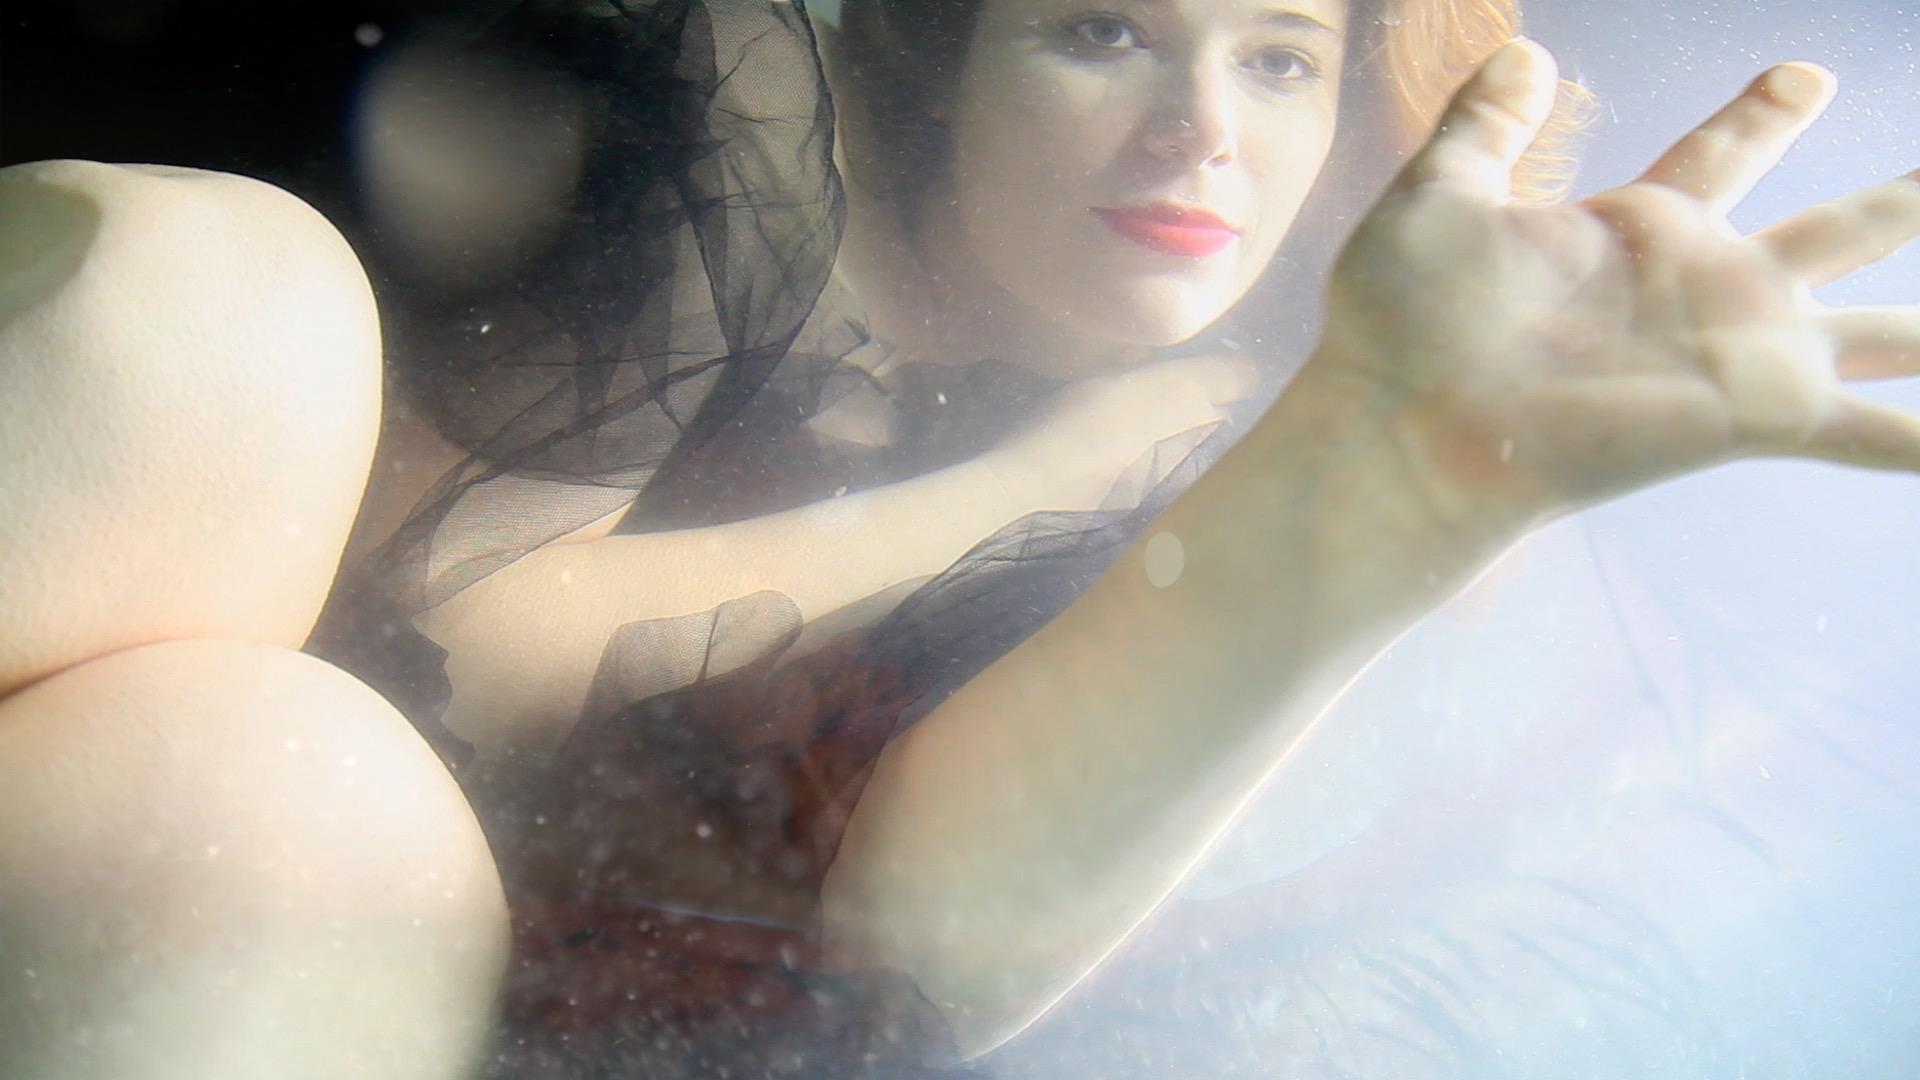 fever-clip-video-viviane-riberaigua-realisateur-paca Director Music Video-Réalisateur Viviane-Riberaigua